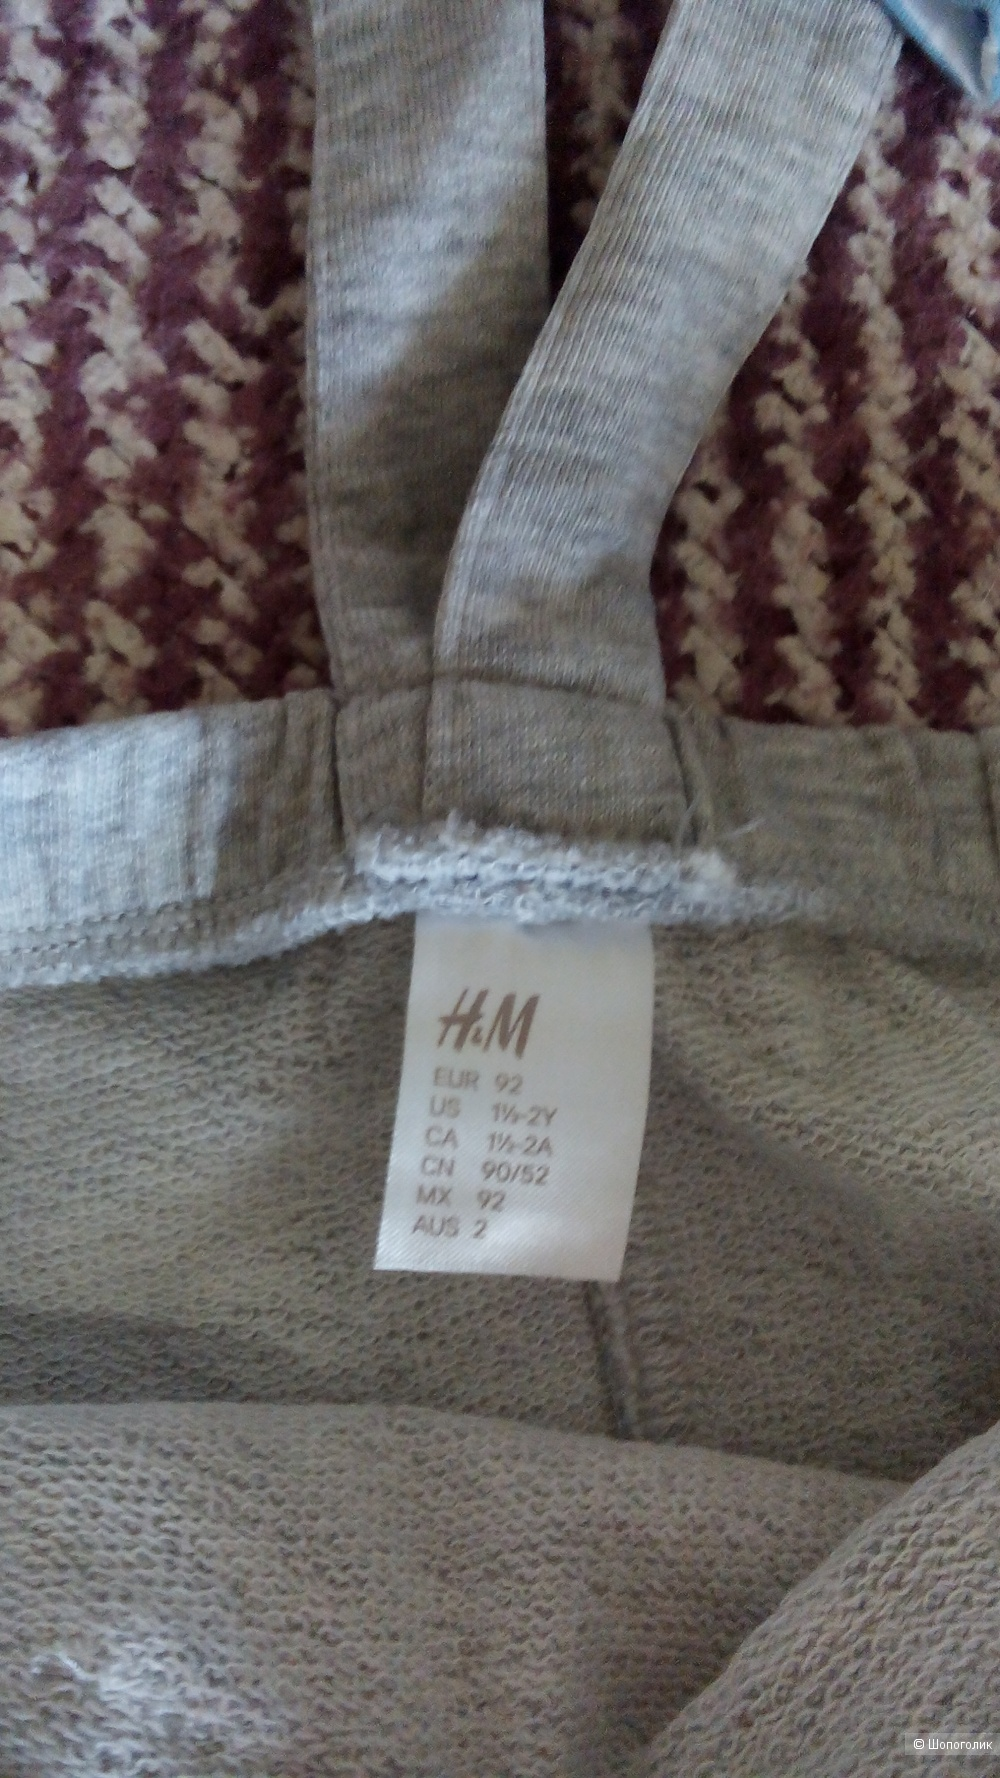 Топ и комбинезон H&M, размер 92